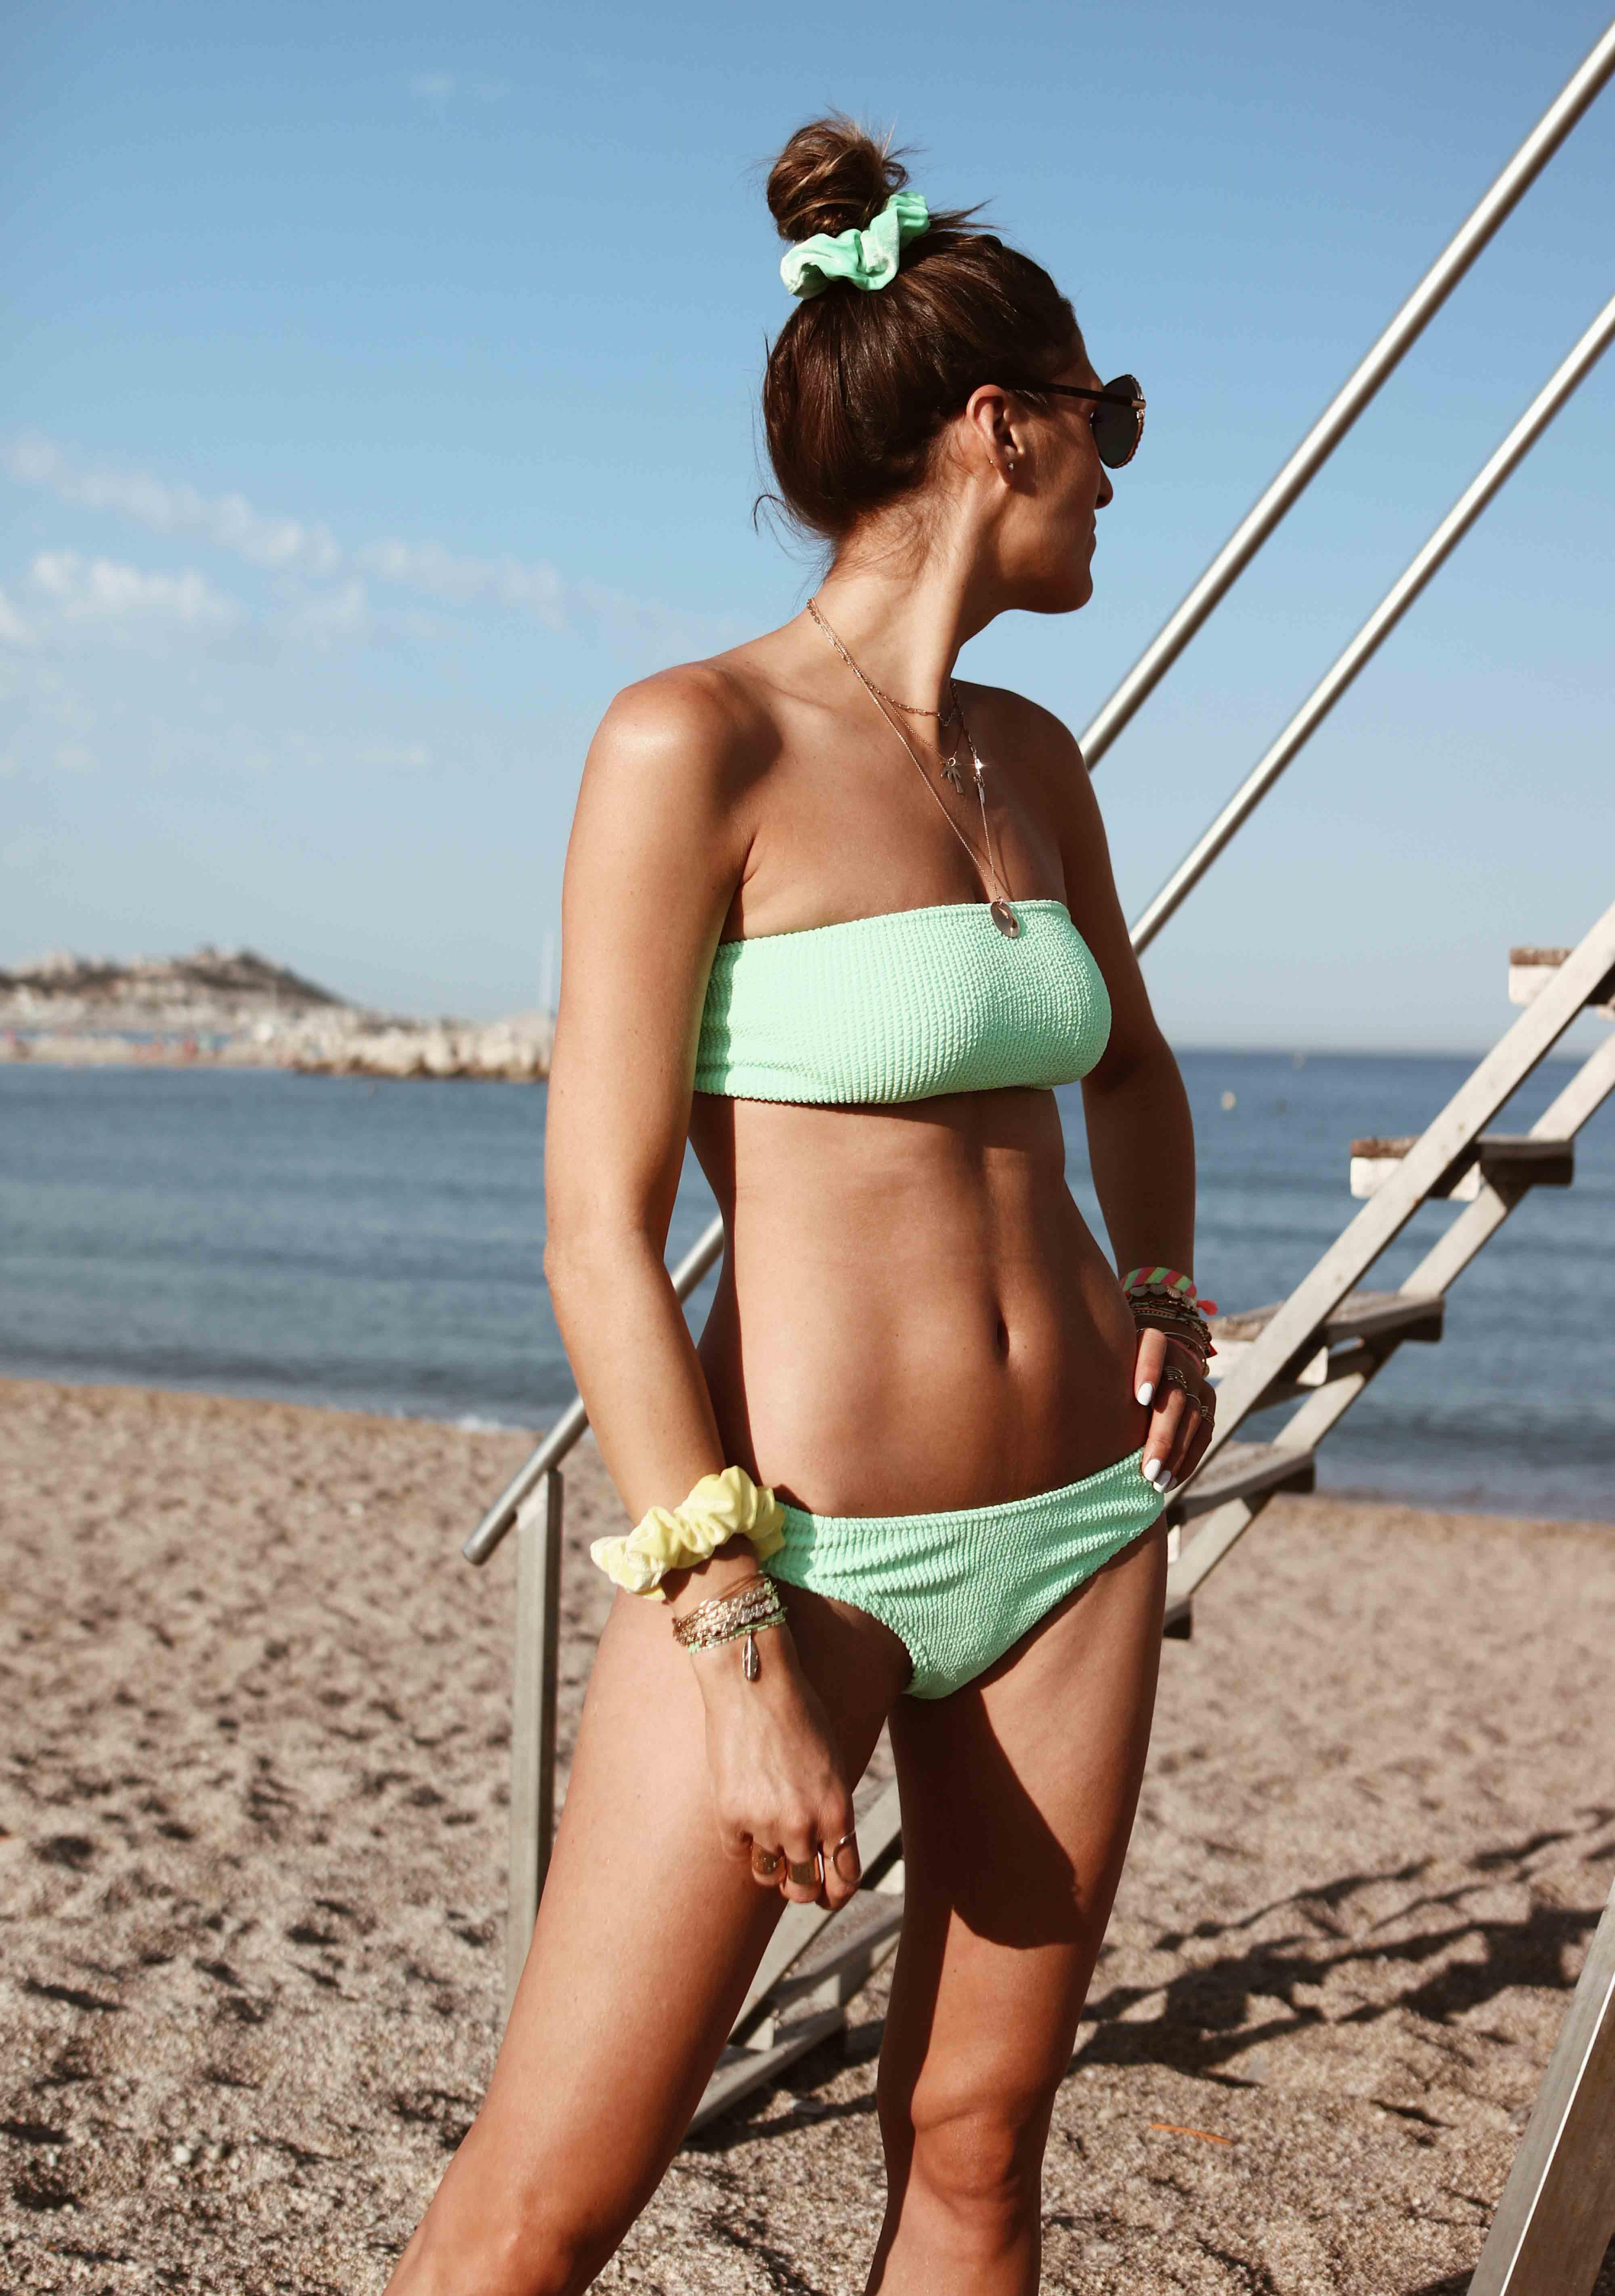 @chon.and.chon - www.chonandchon.com - neon bikini, bikini fluo, bikini life, beach lover, beach life, bikini body